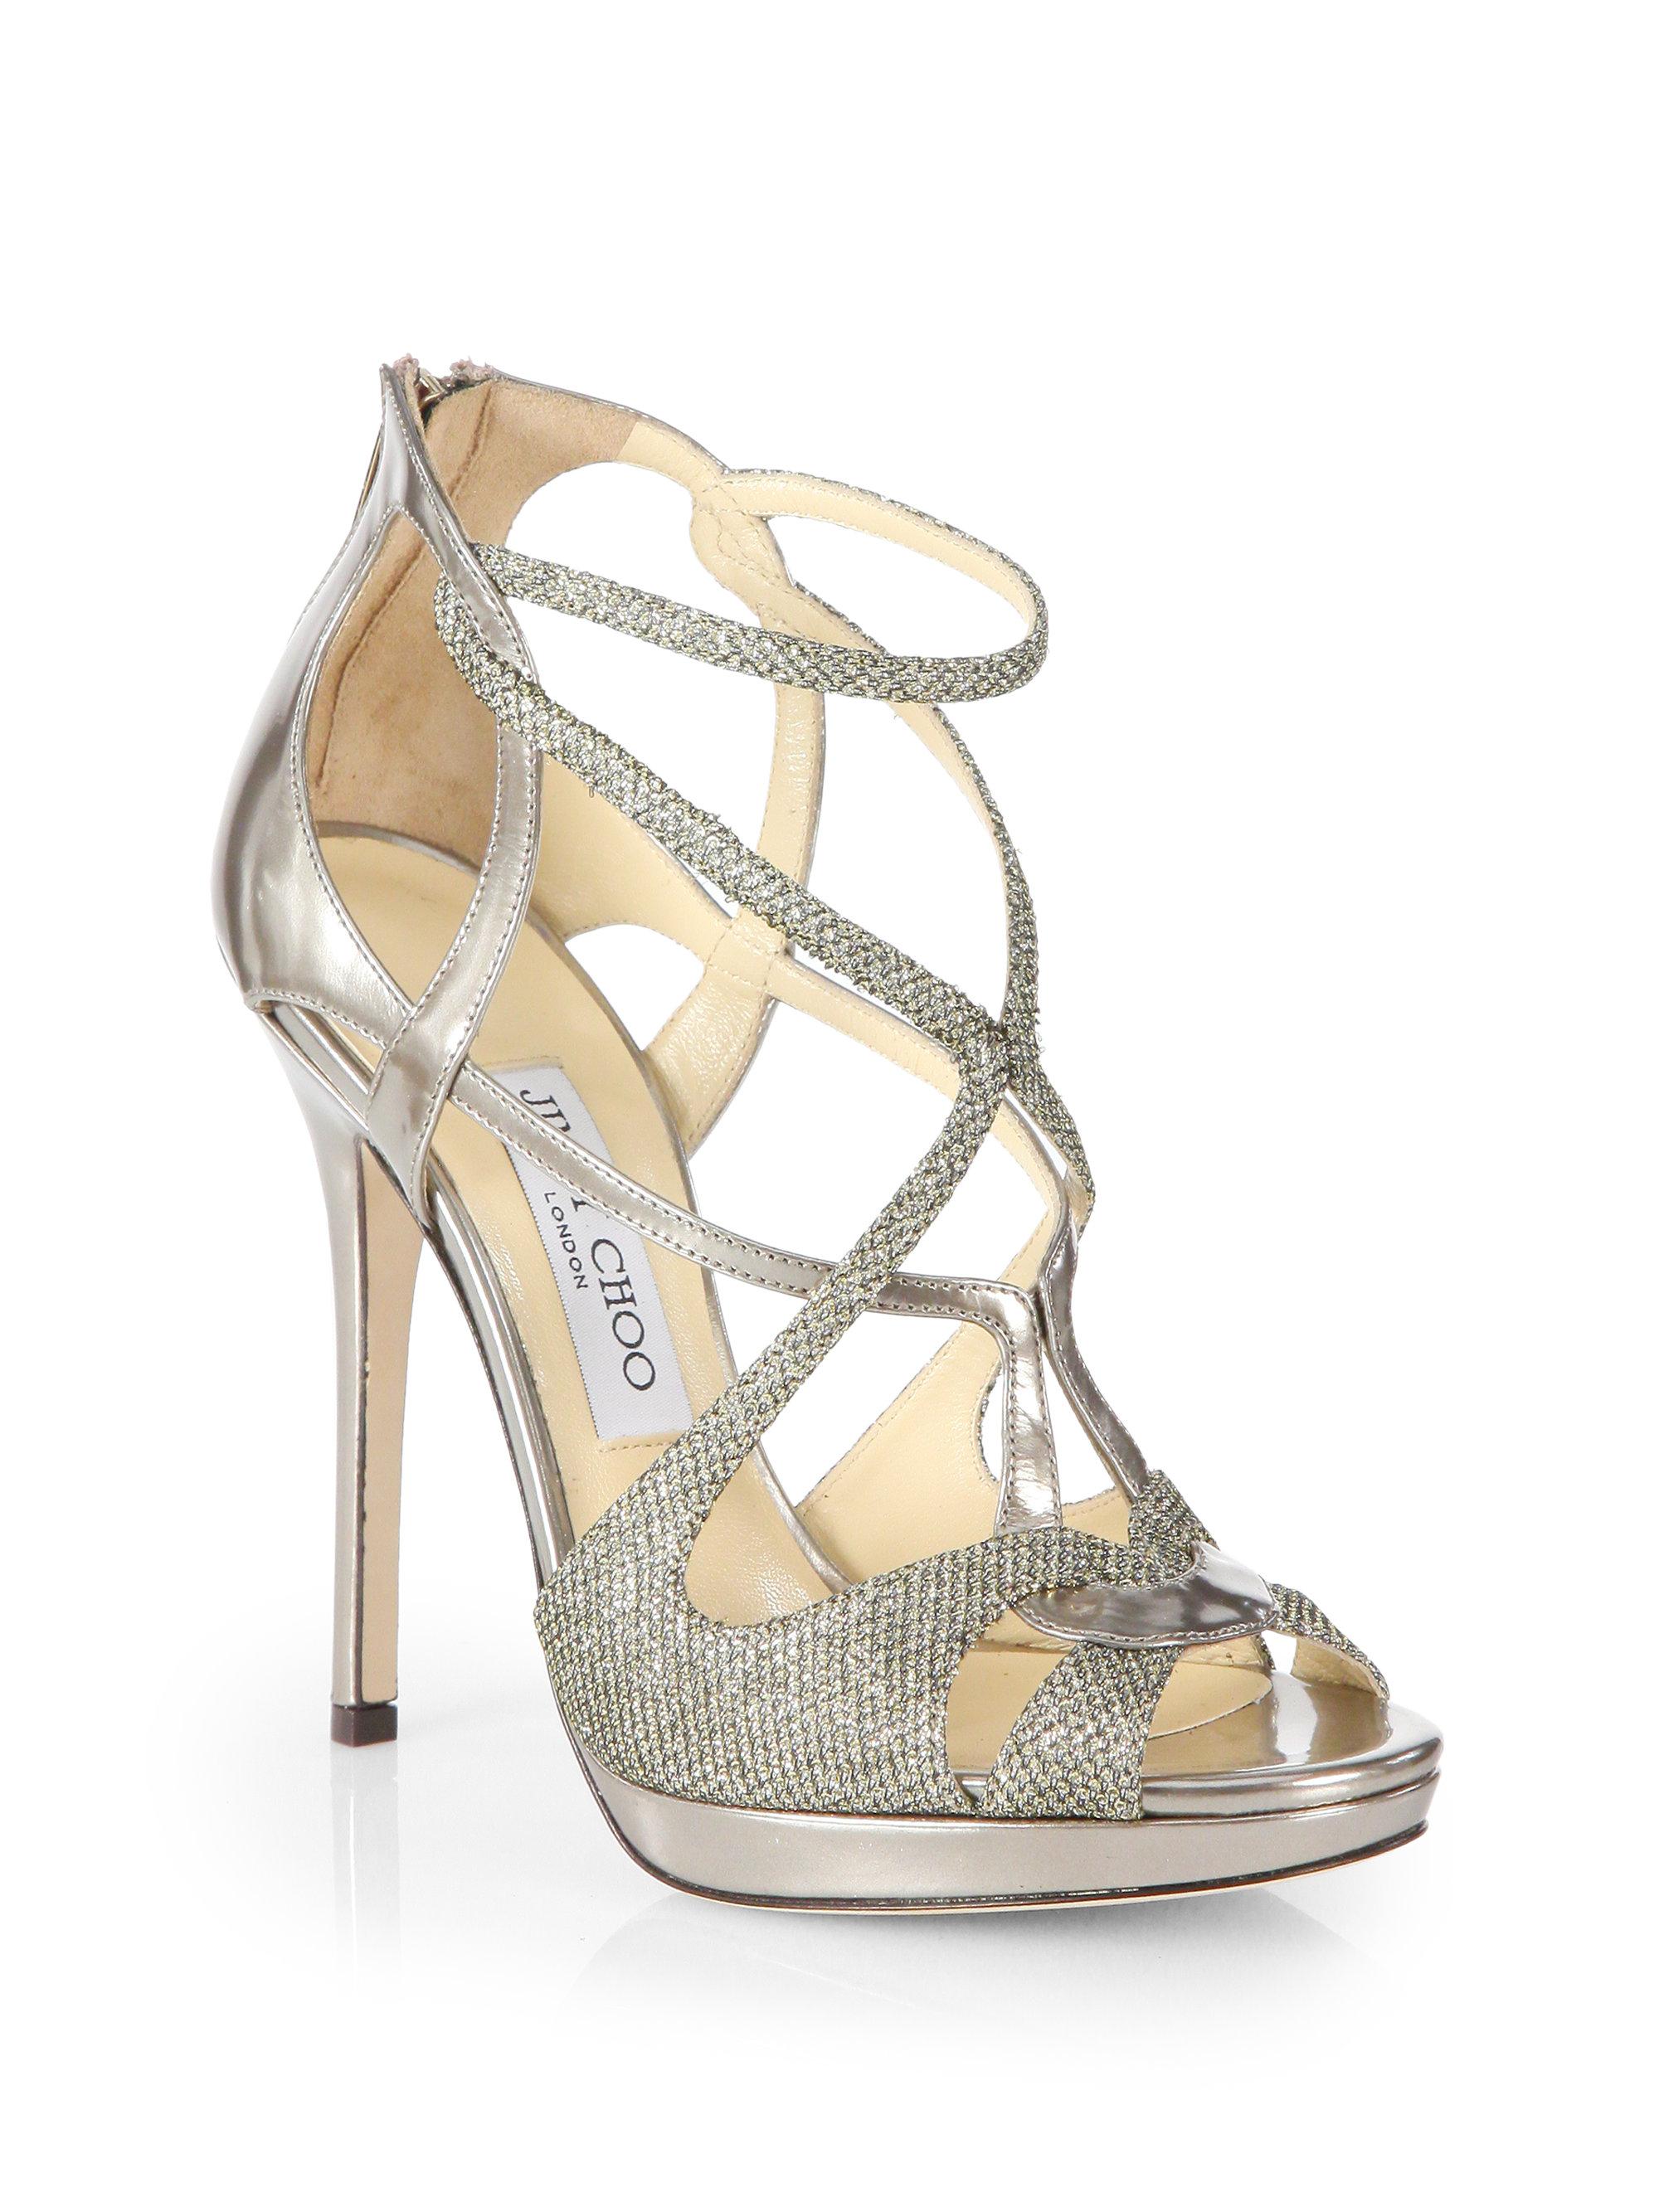 8e62a295752d Lyst - Jimmy Choo Sazerac Glitter Metallic Leather Strappy Sandals ...